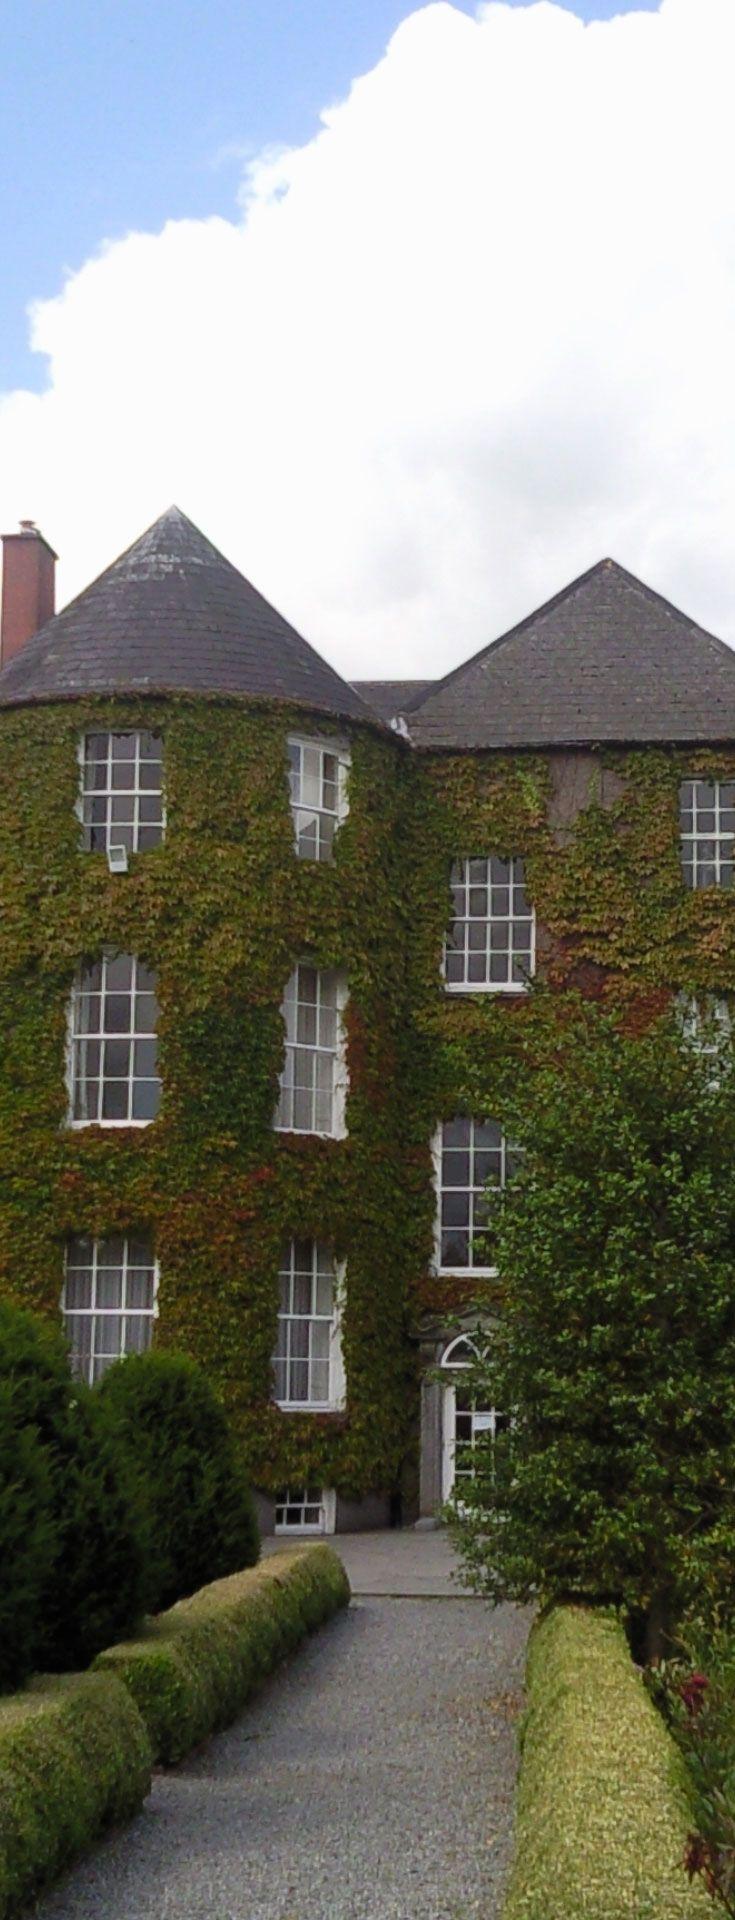 Butler House - Kilkenny Castle - Kilkenny City | Ireland